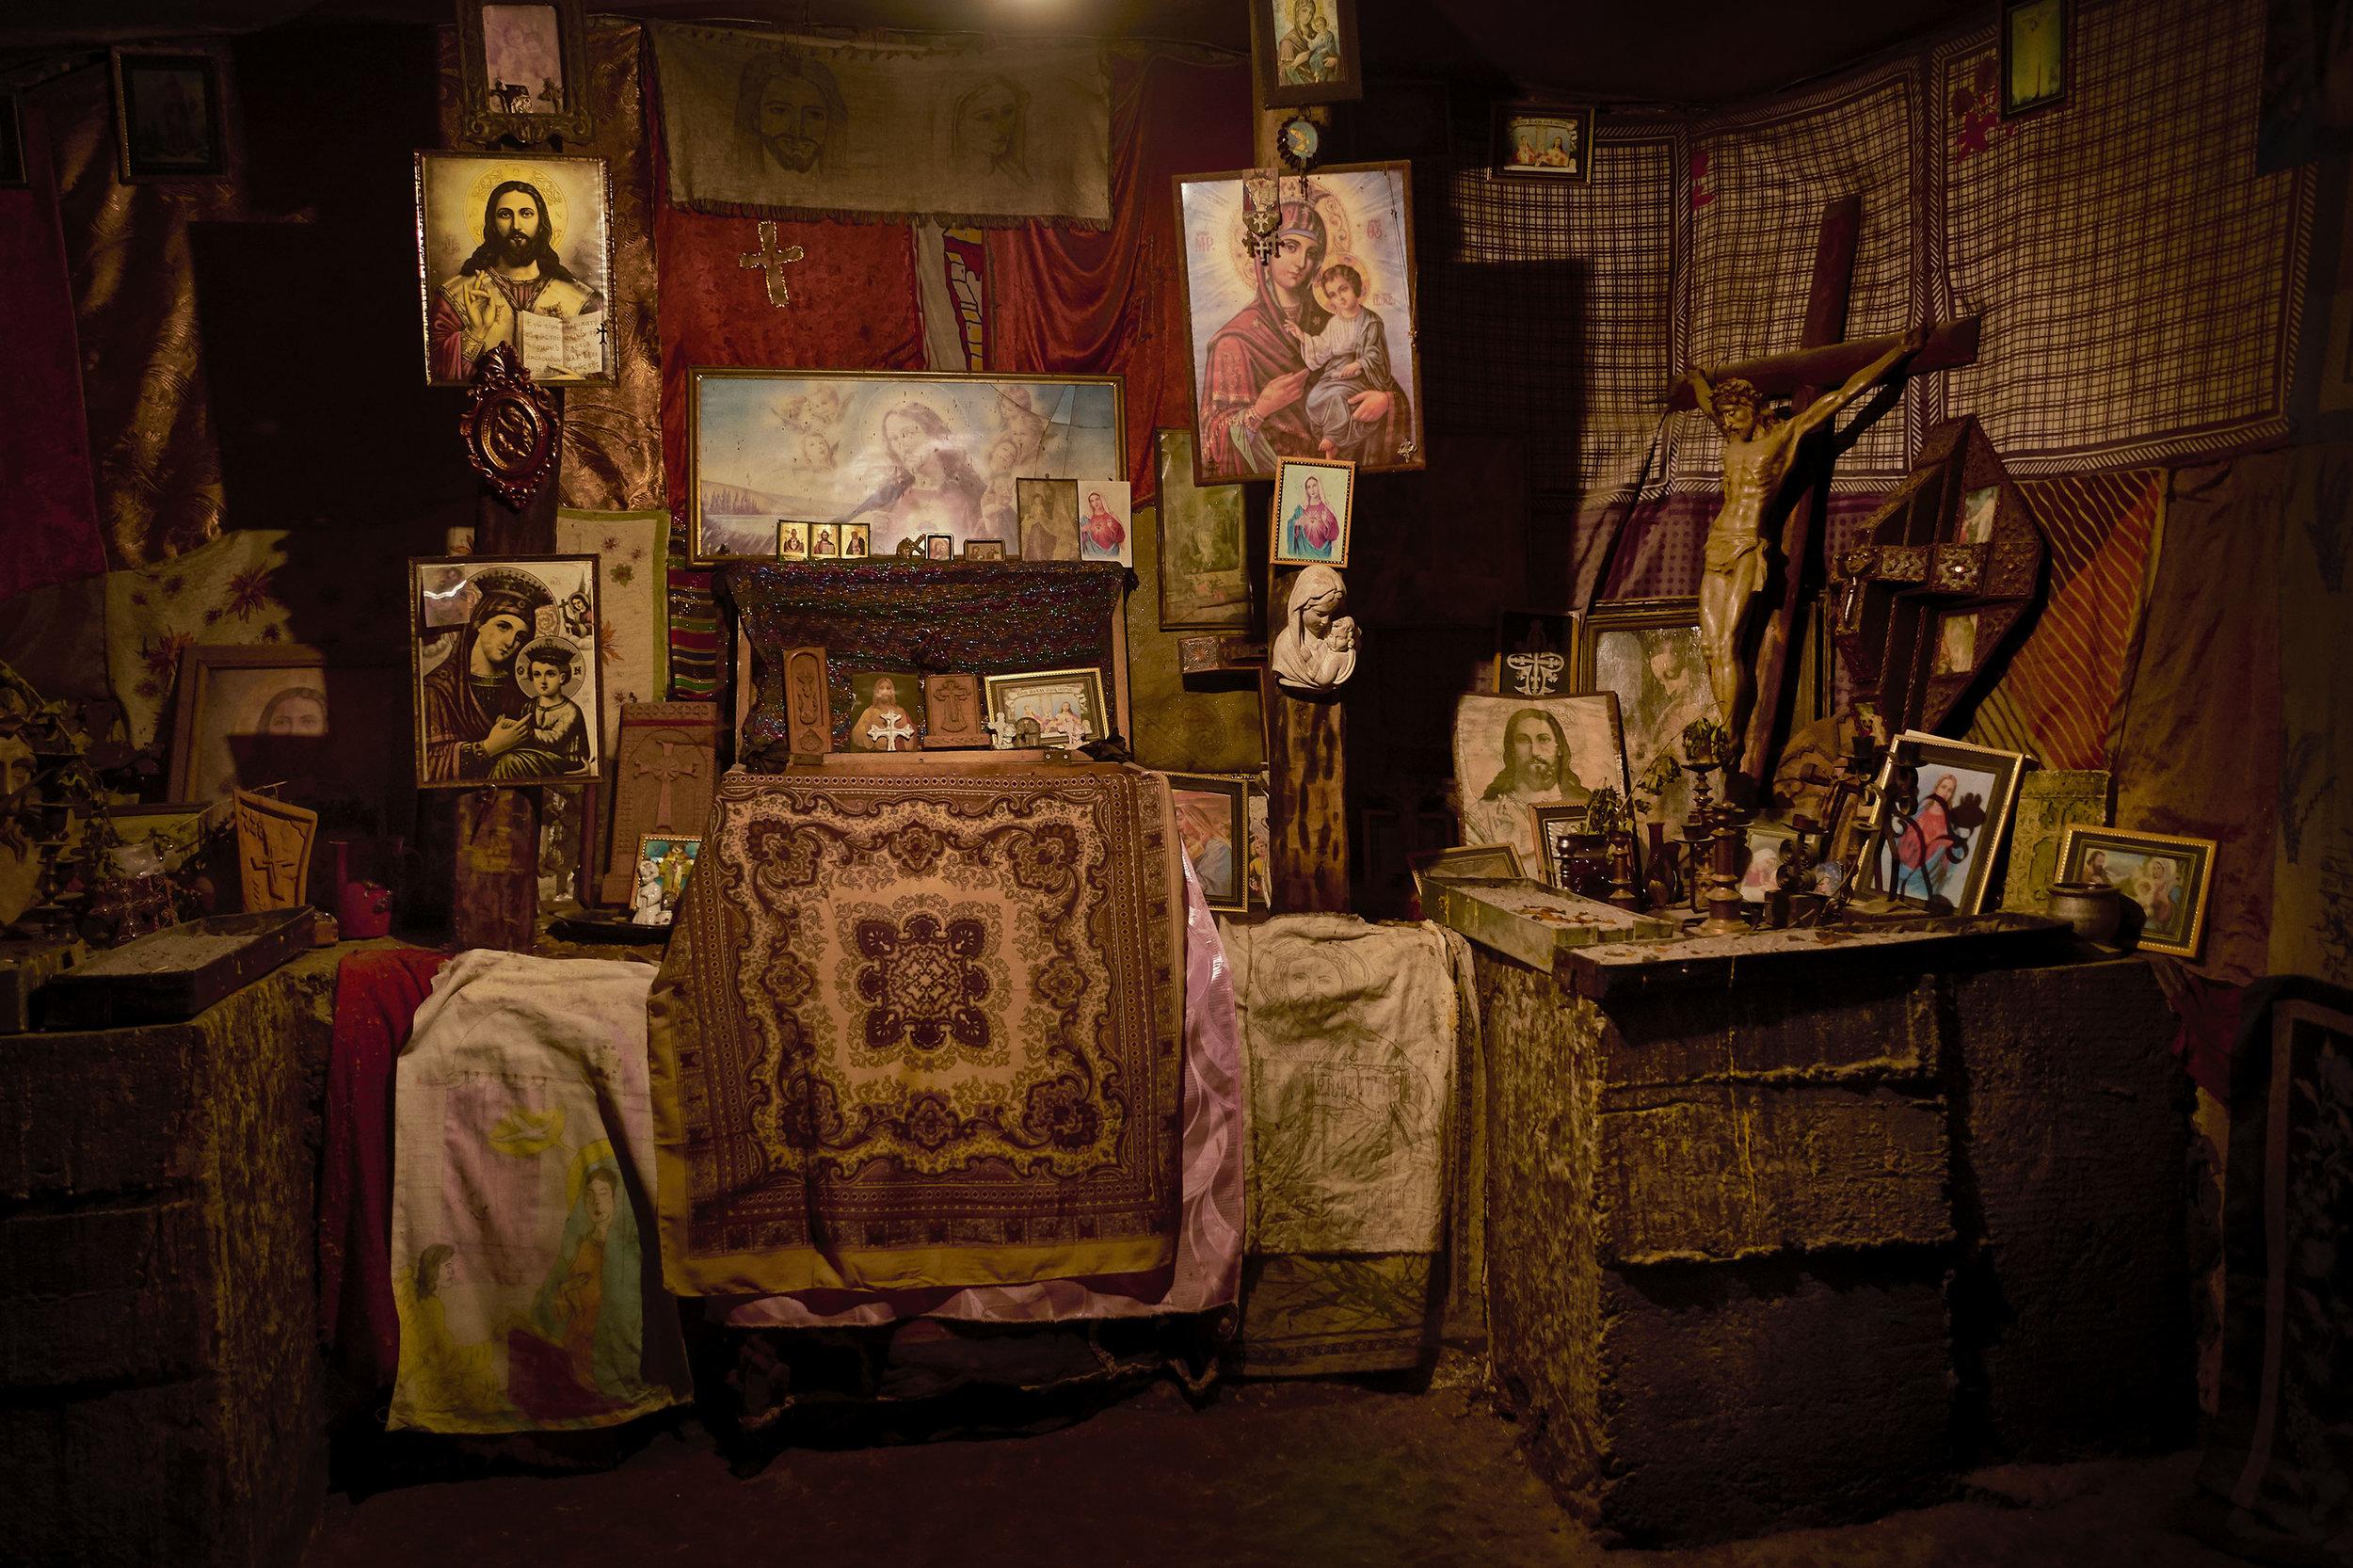 Armenia-shrine-inside-house